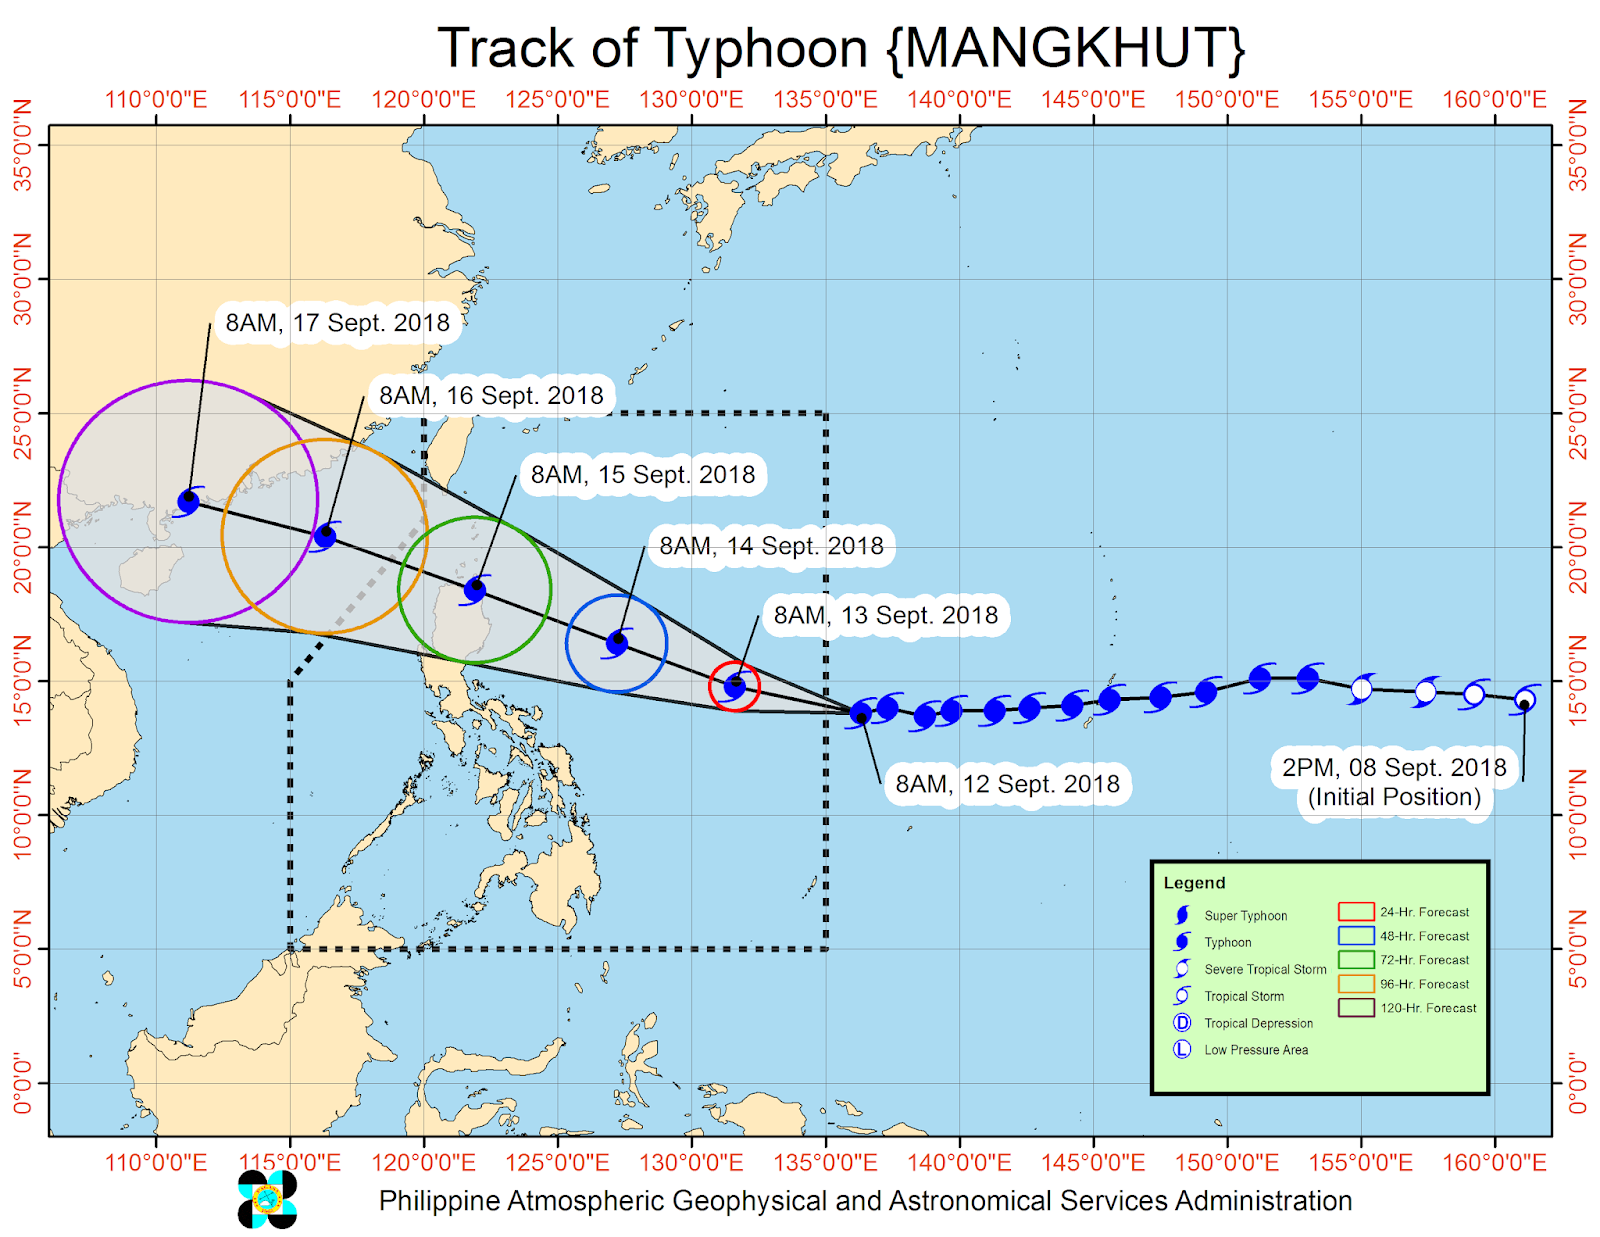 Typhoon Mangkhut (Ompong) track